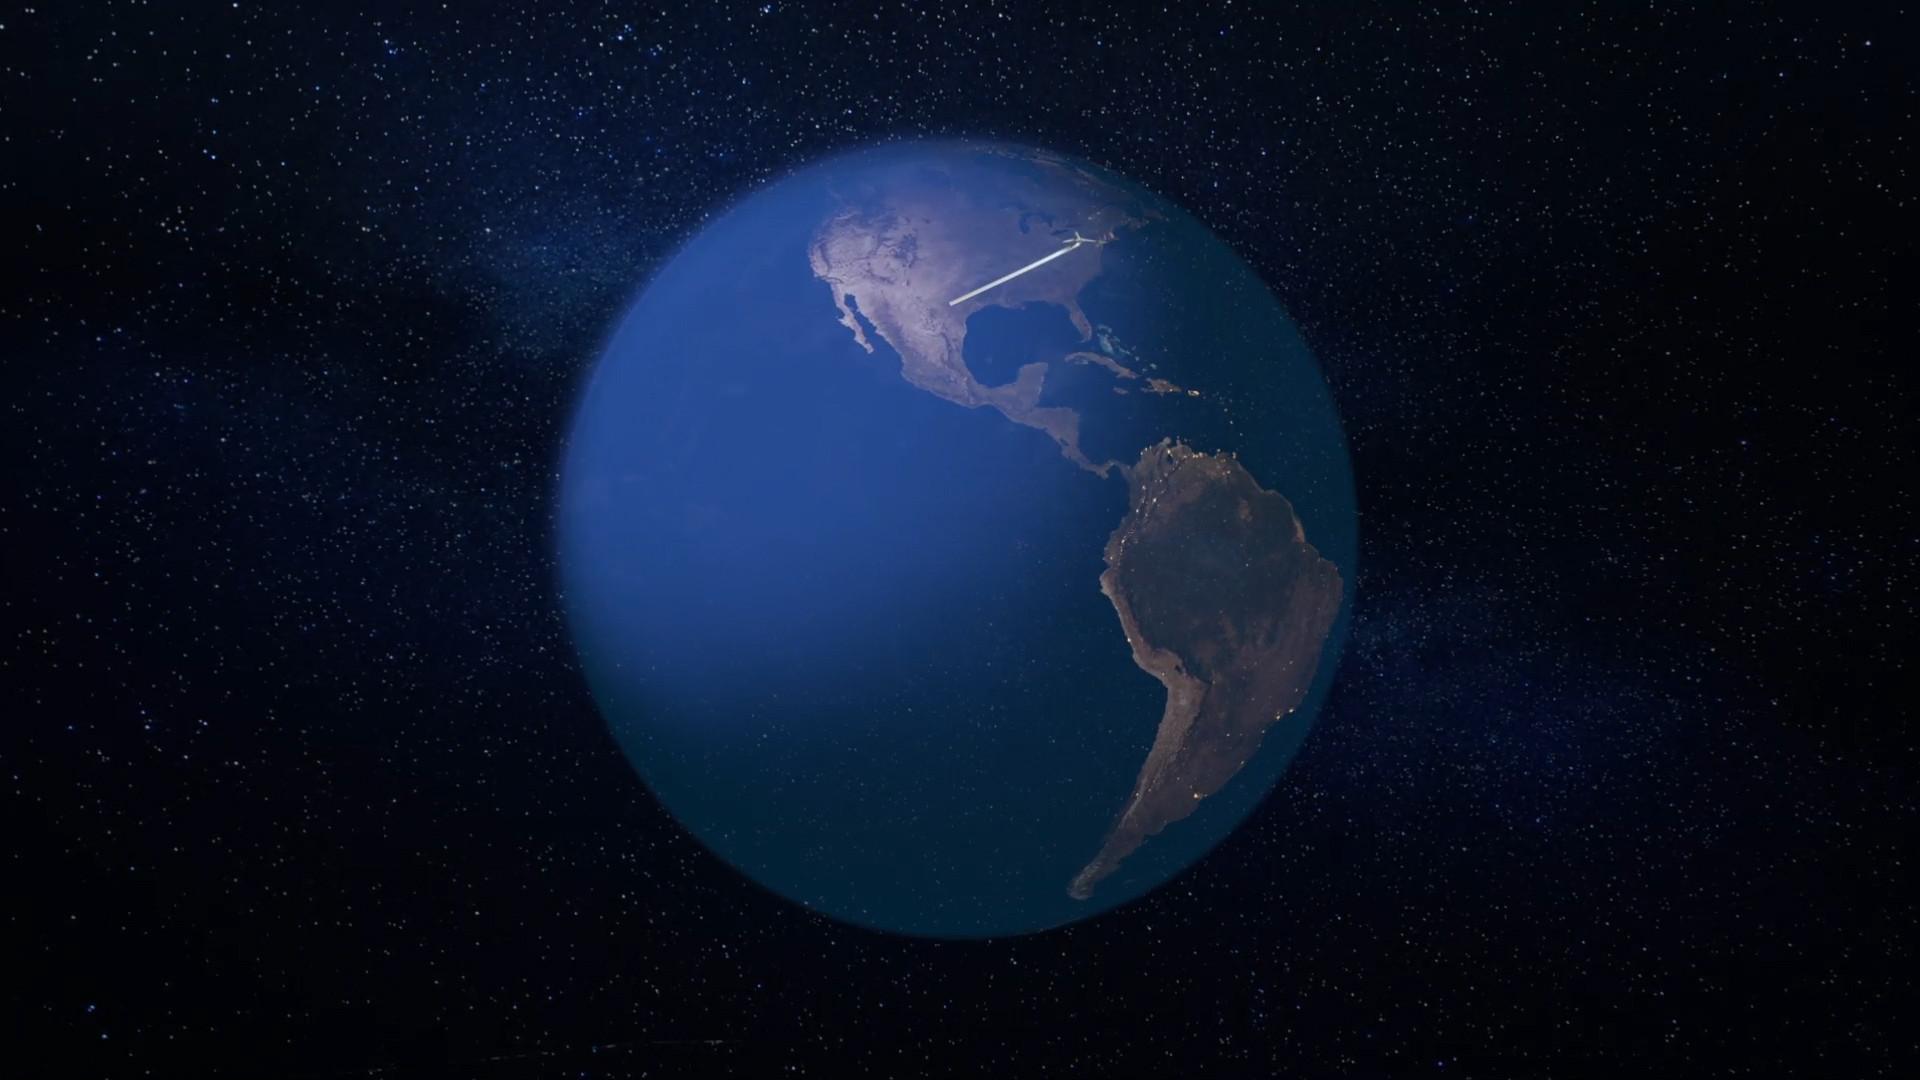 01. One More Orbit Flight Path